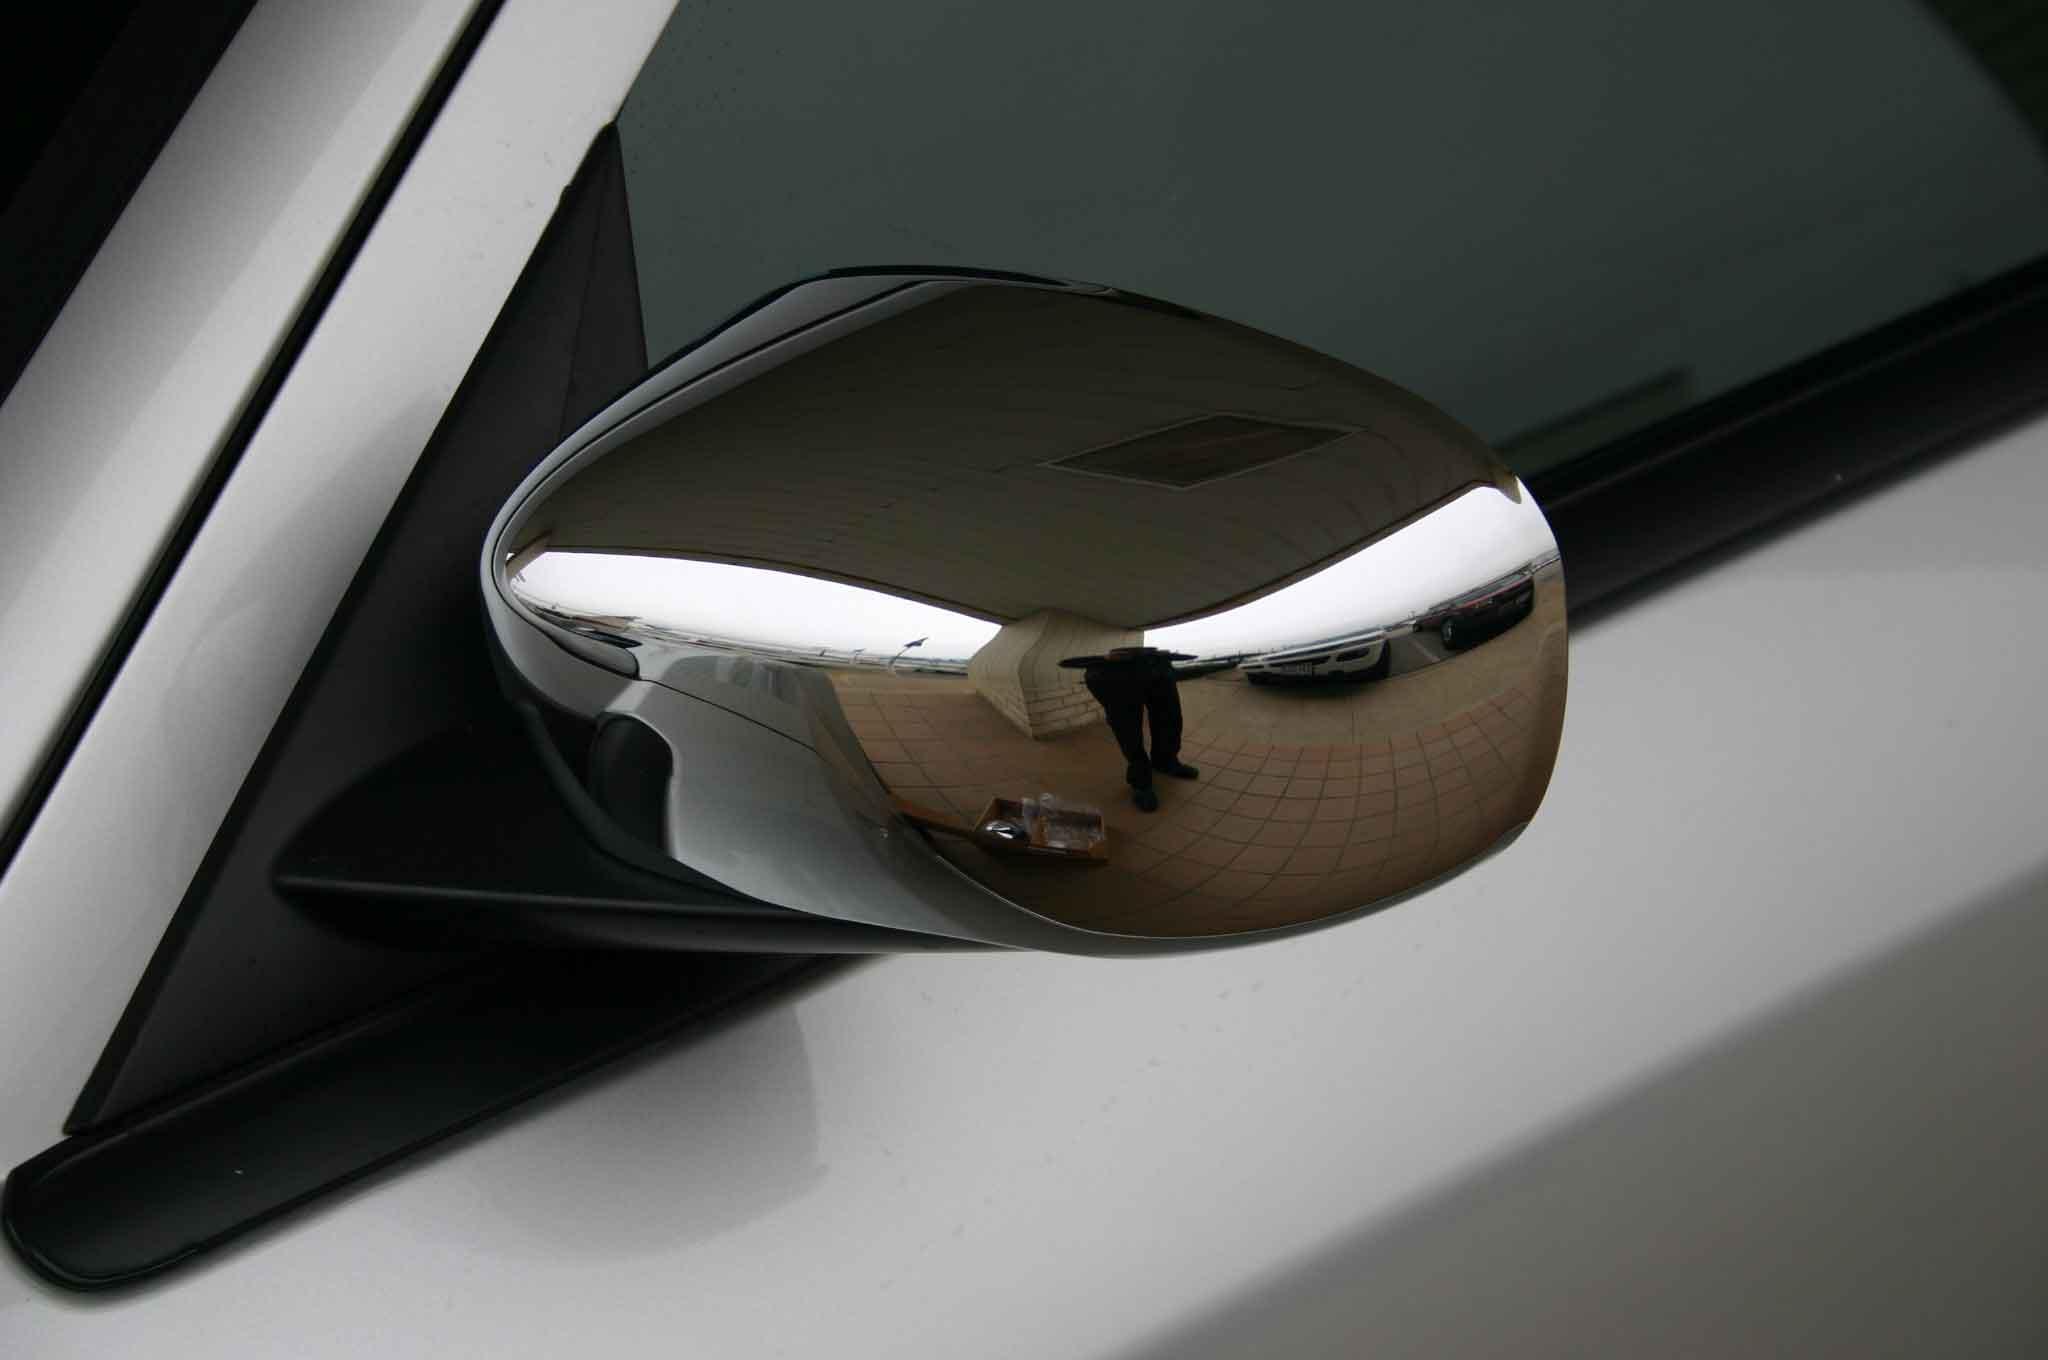 Chrysler Chrome Mirror Cover Trim Molding